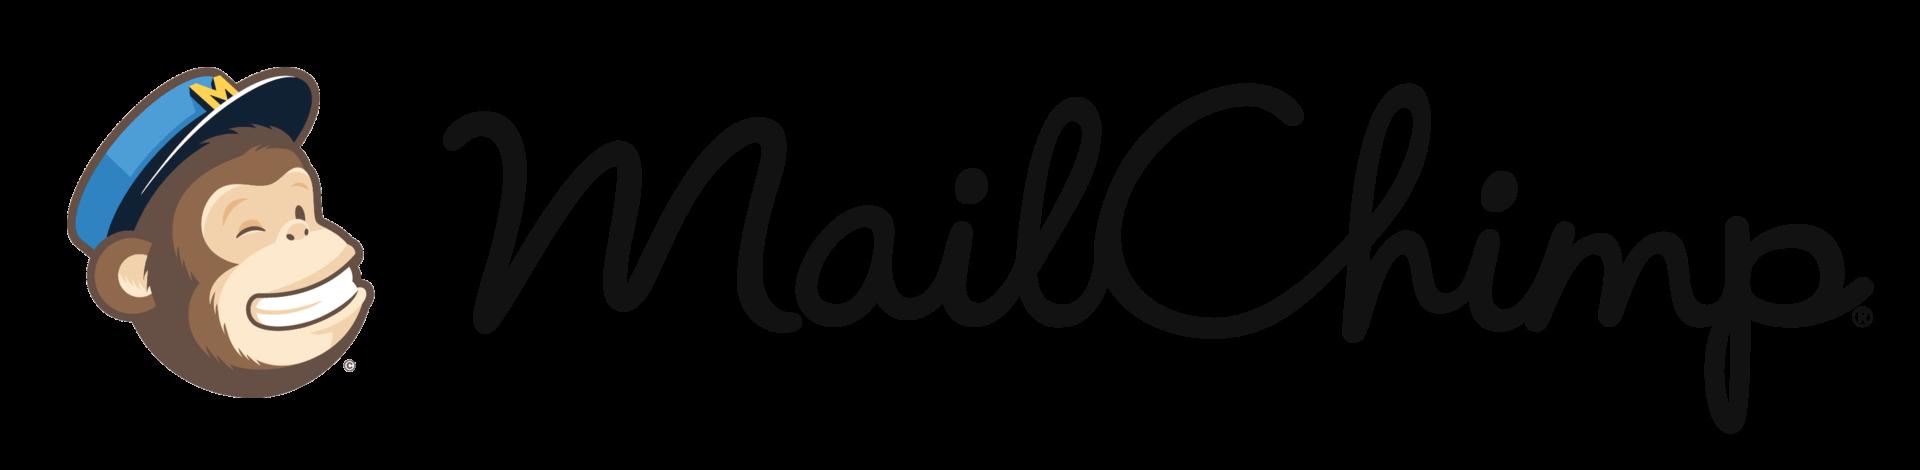 MailChimp-logo-horiz.png